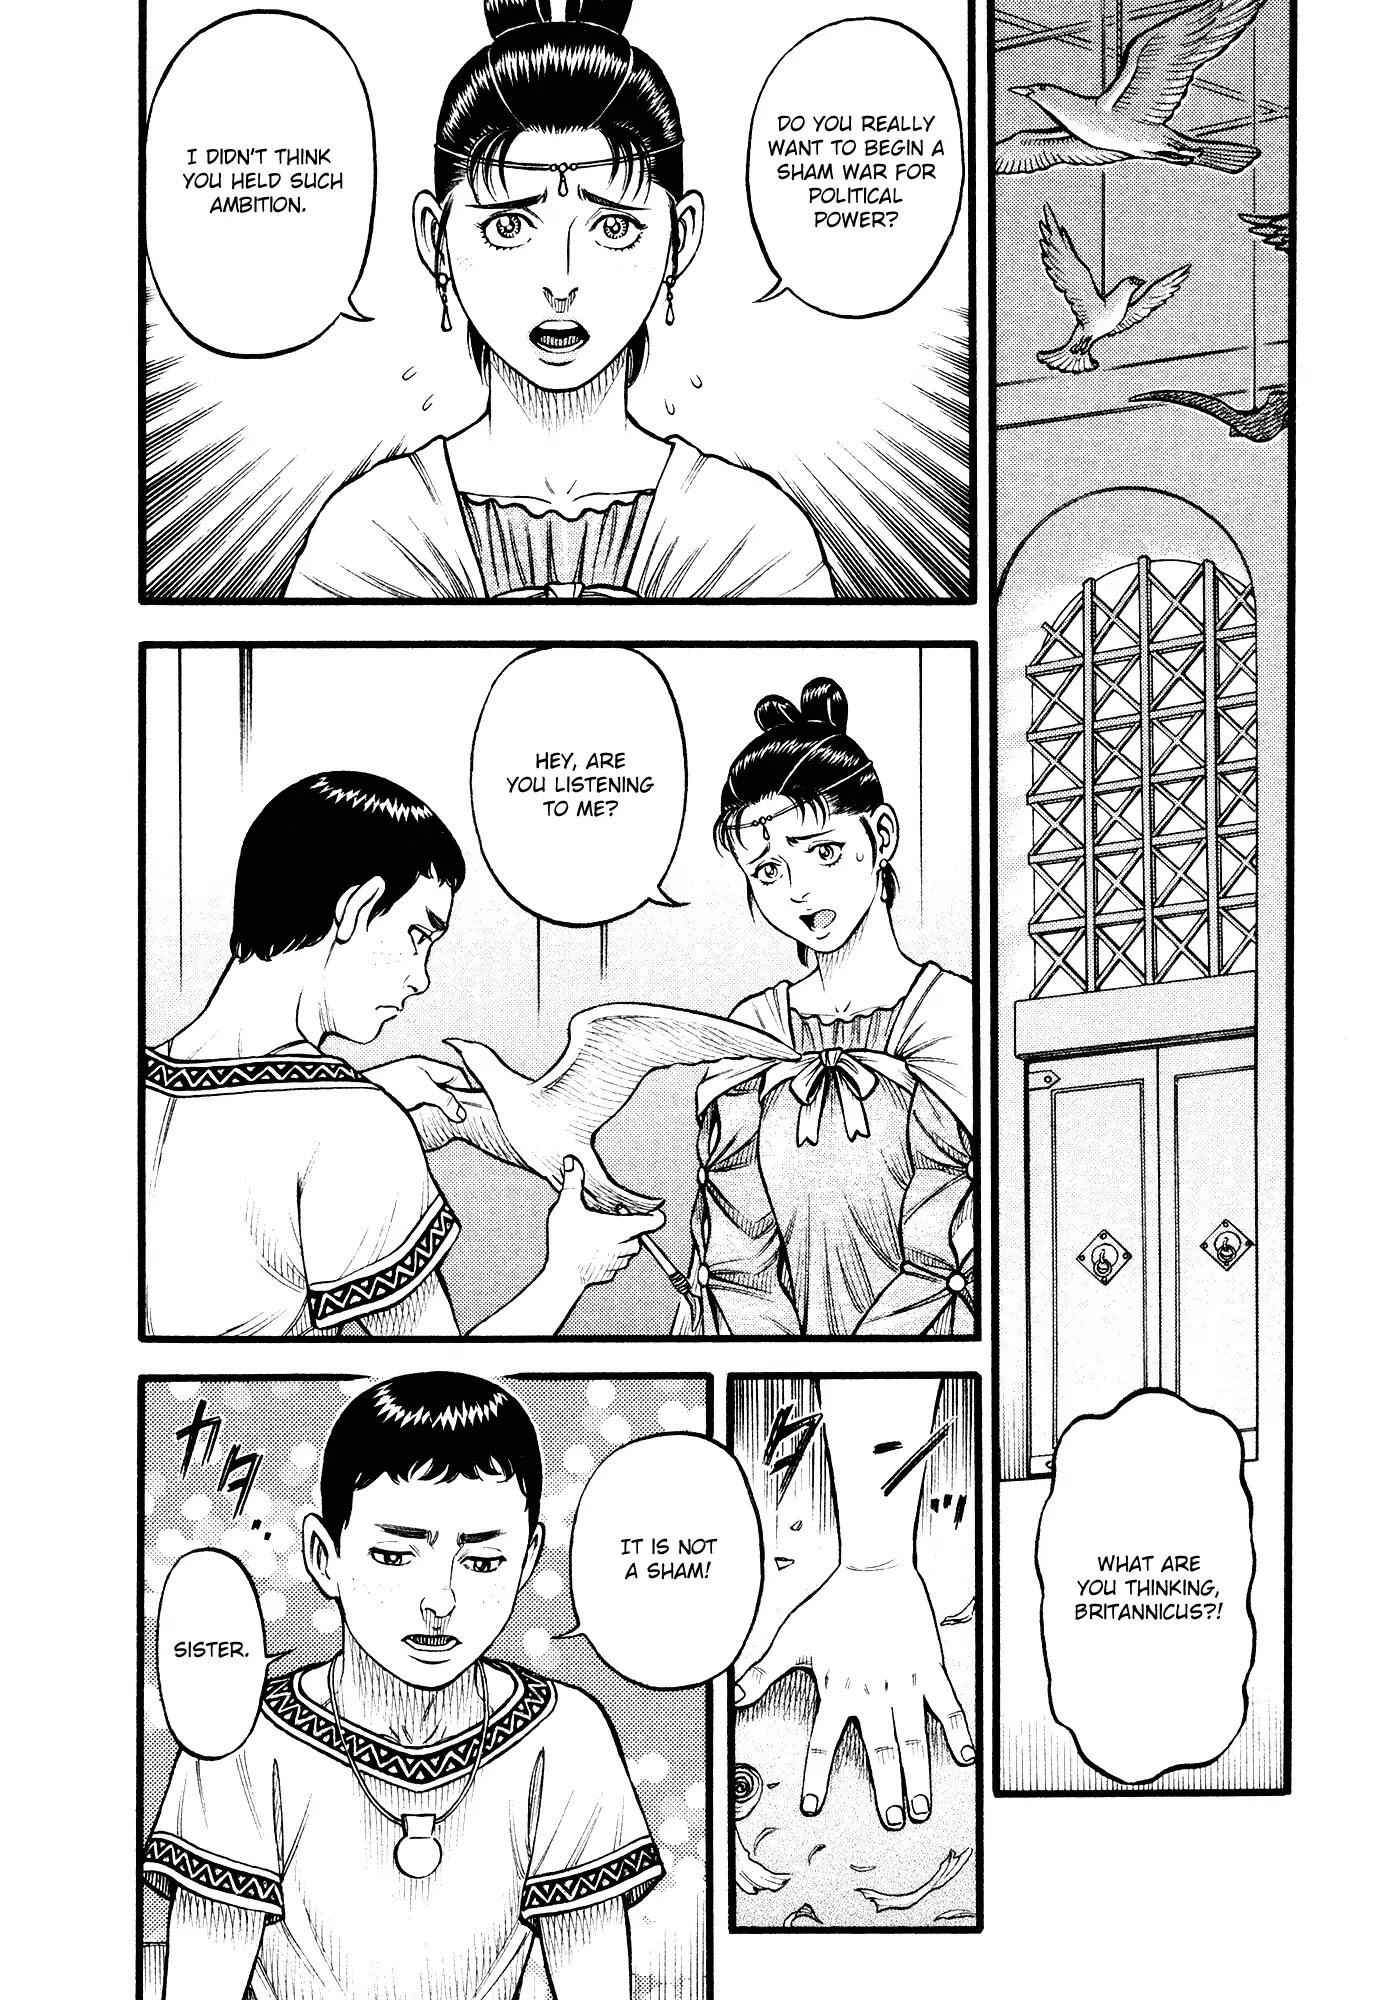 Kento Ankokuden Cestvs - chapter 150-eng-li